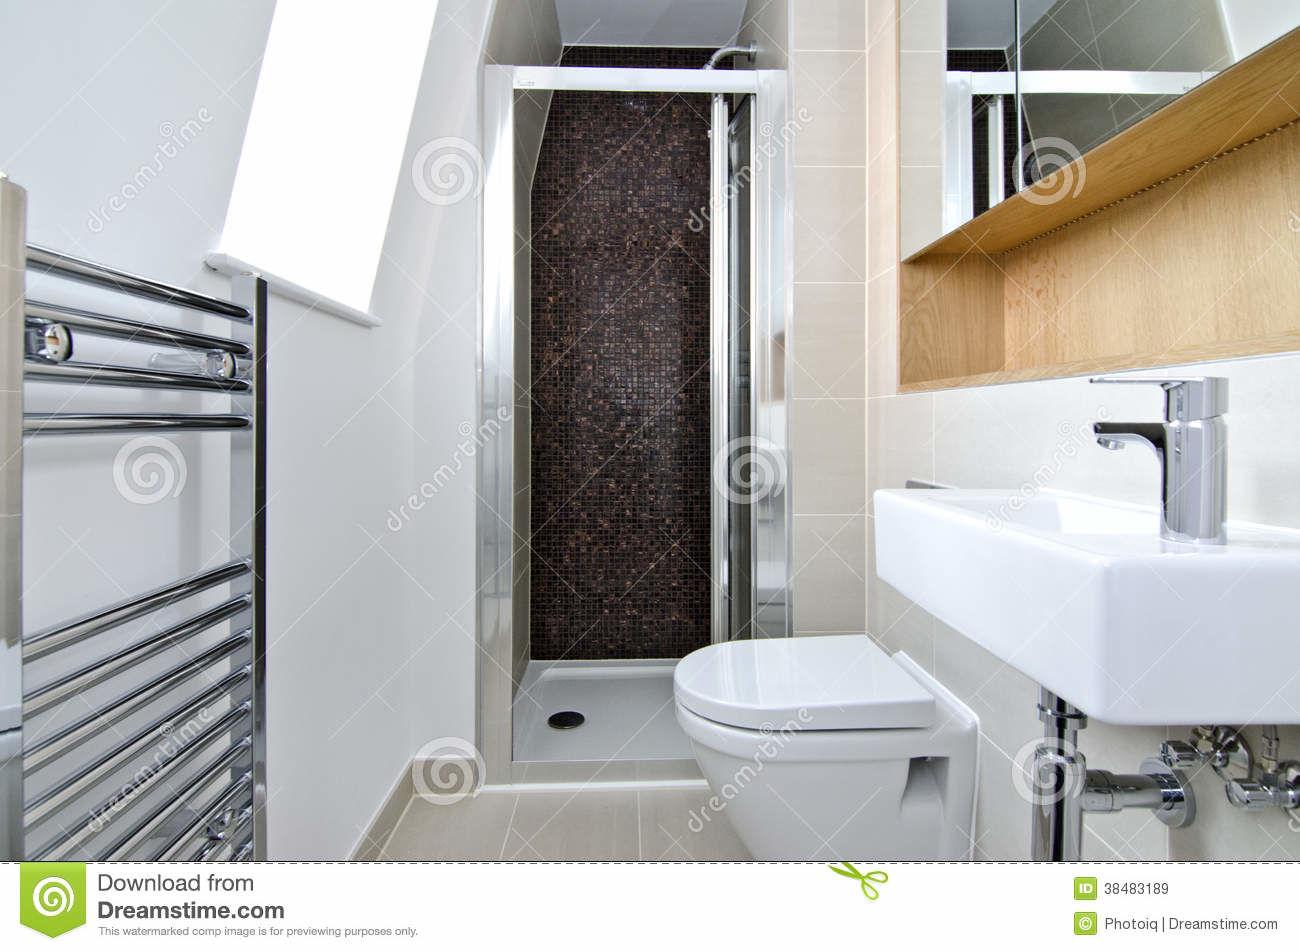 stylish small heater for bathroom ideas-Fantastic Small Heater for Bathroom Construction